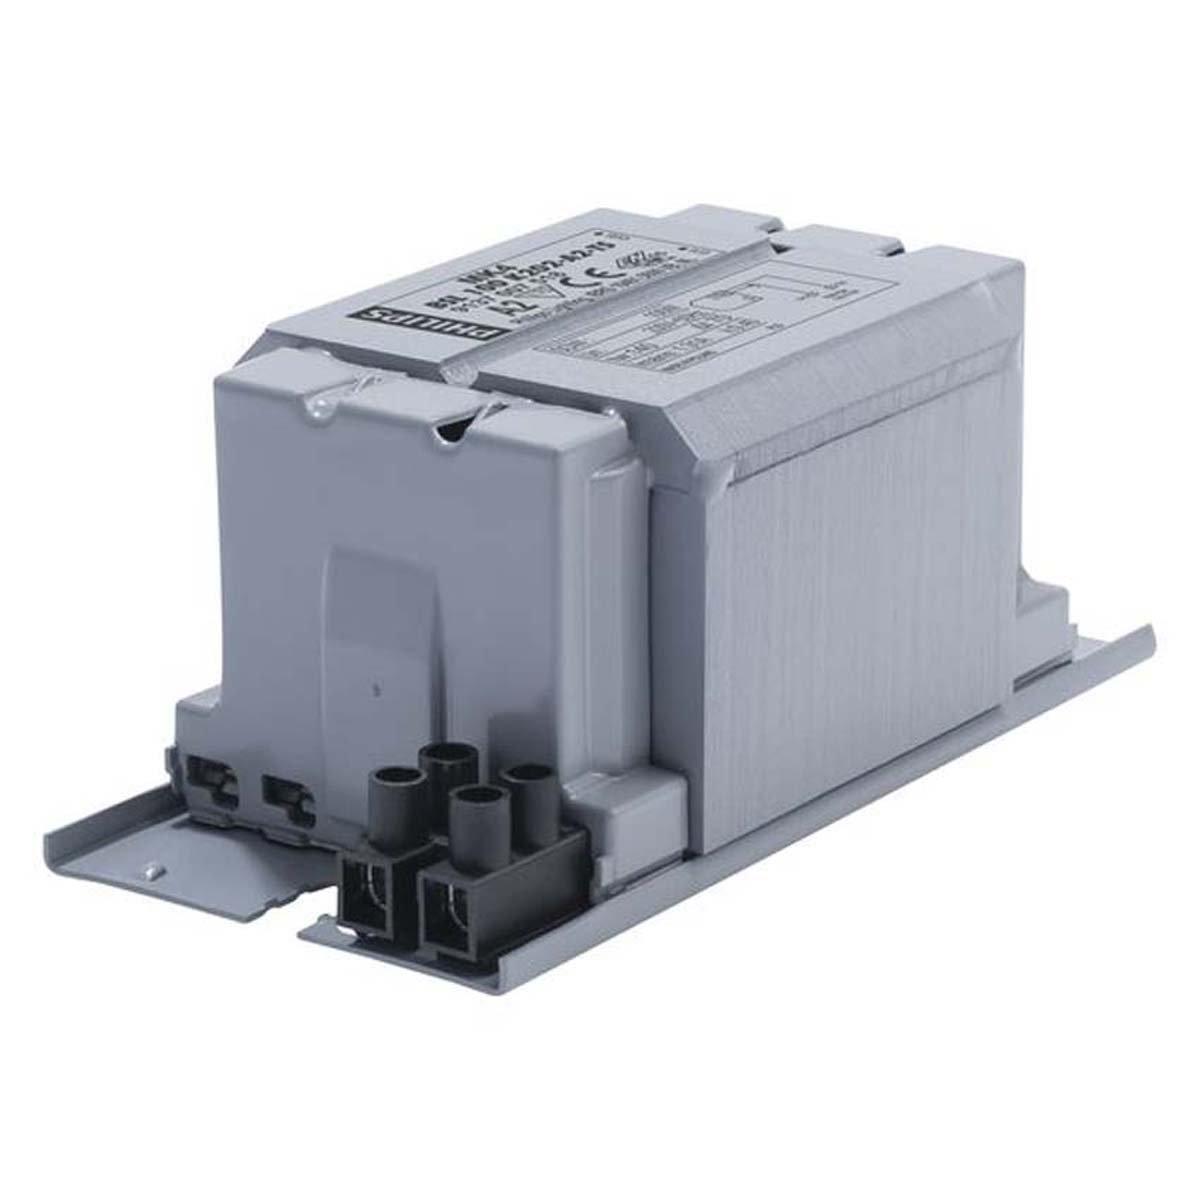 Vorschaltgerä t VVG BSL fü r SDW-T 100 Watt - Philips 100W